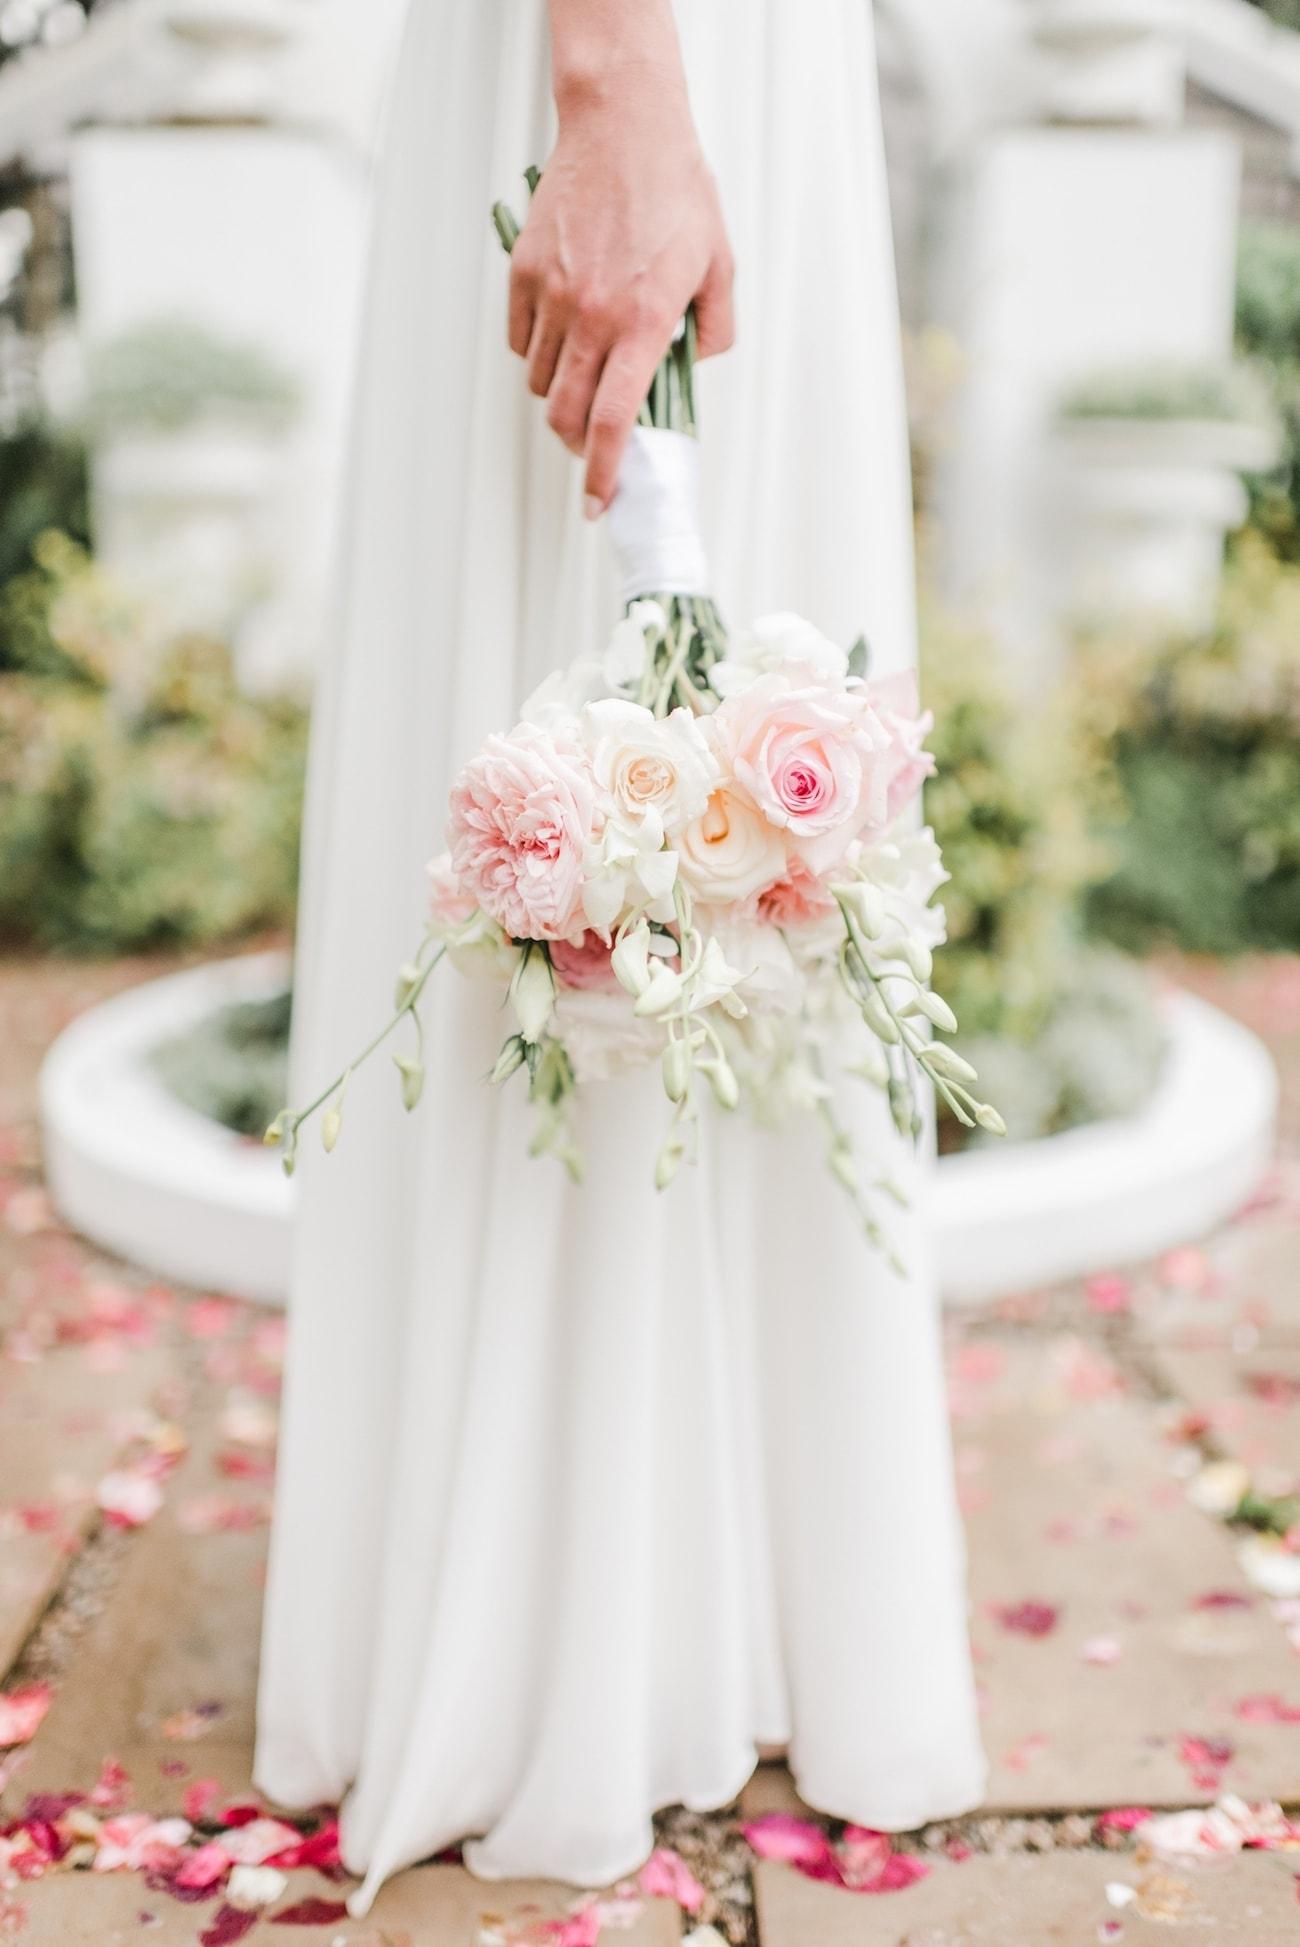 Blush Bouquet   Image: Carla Adel